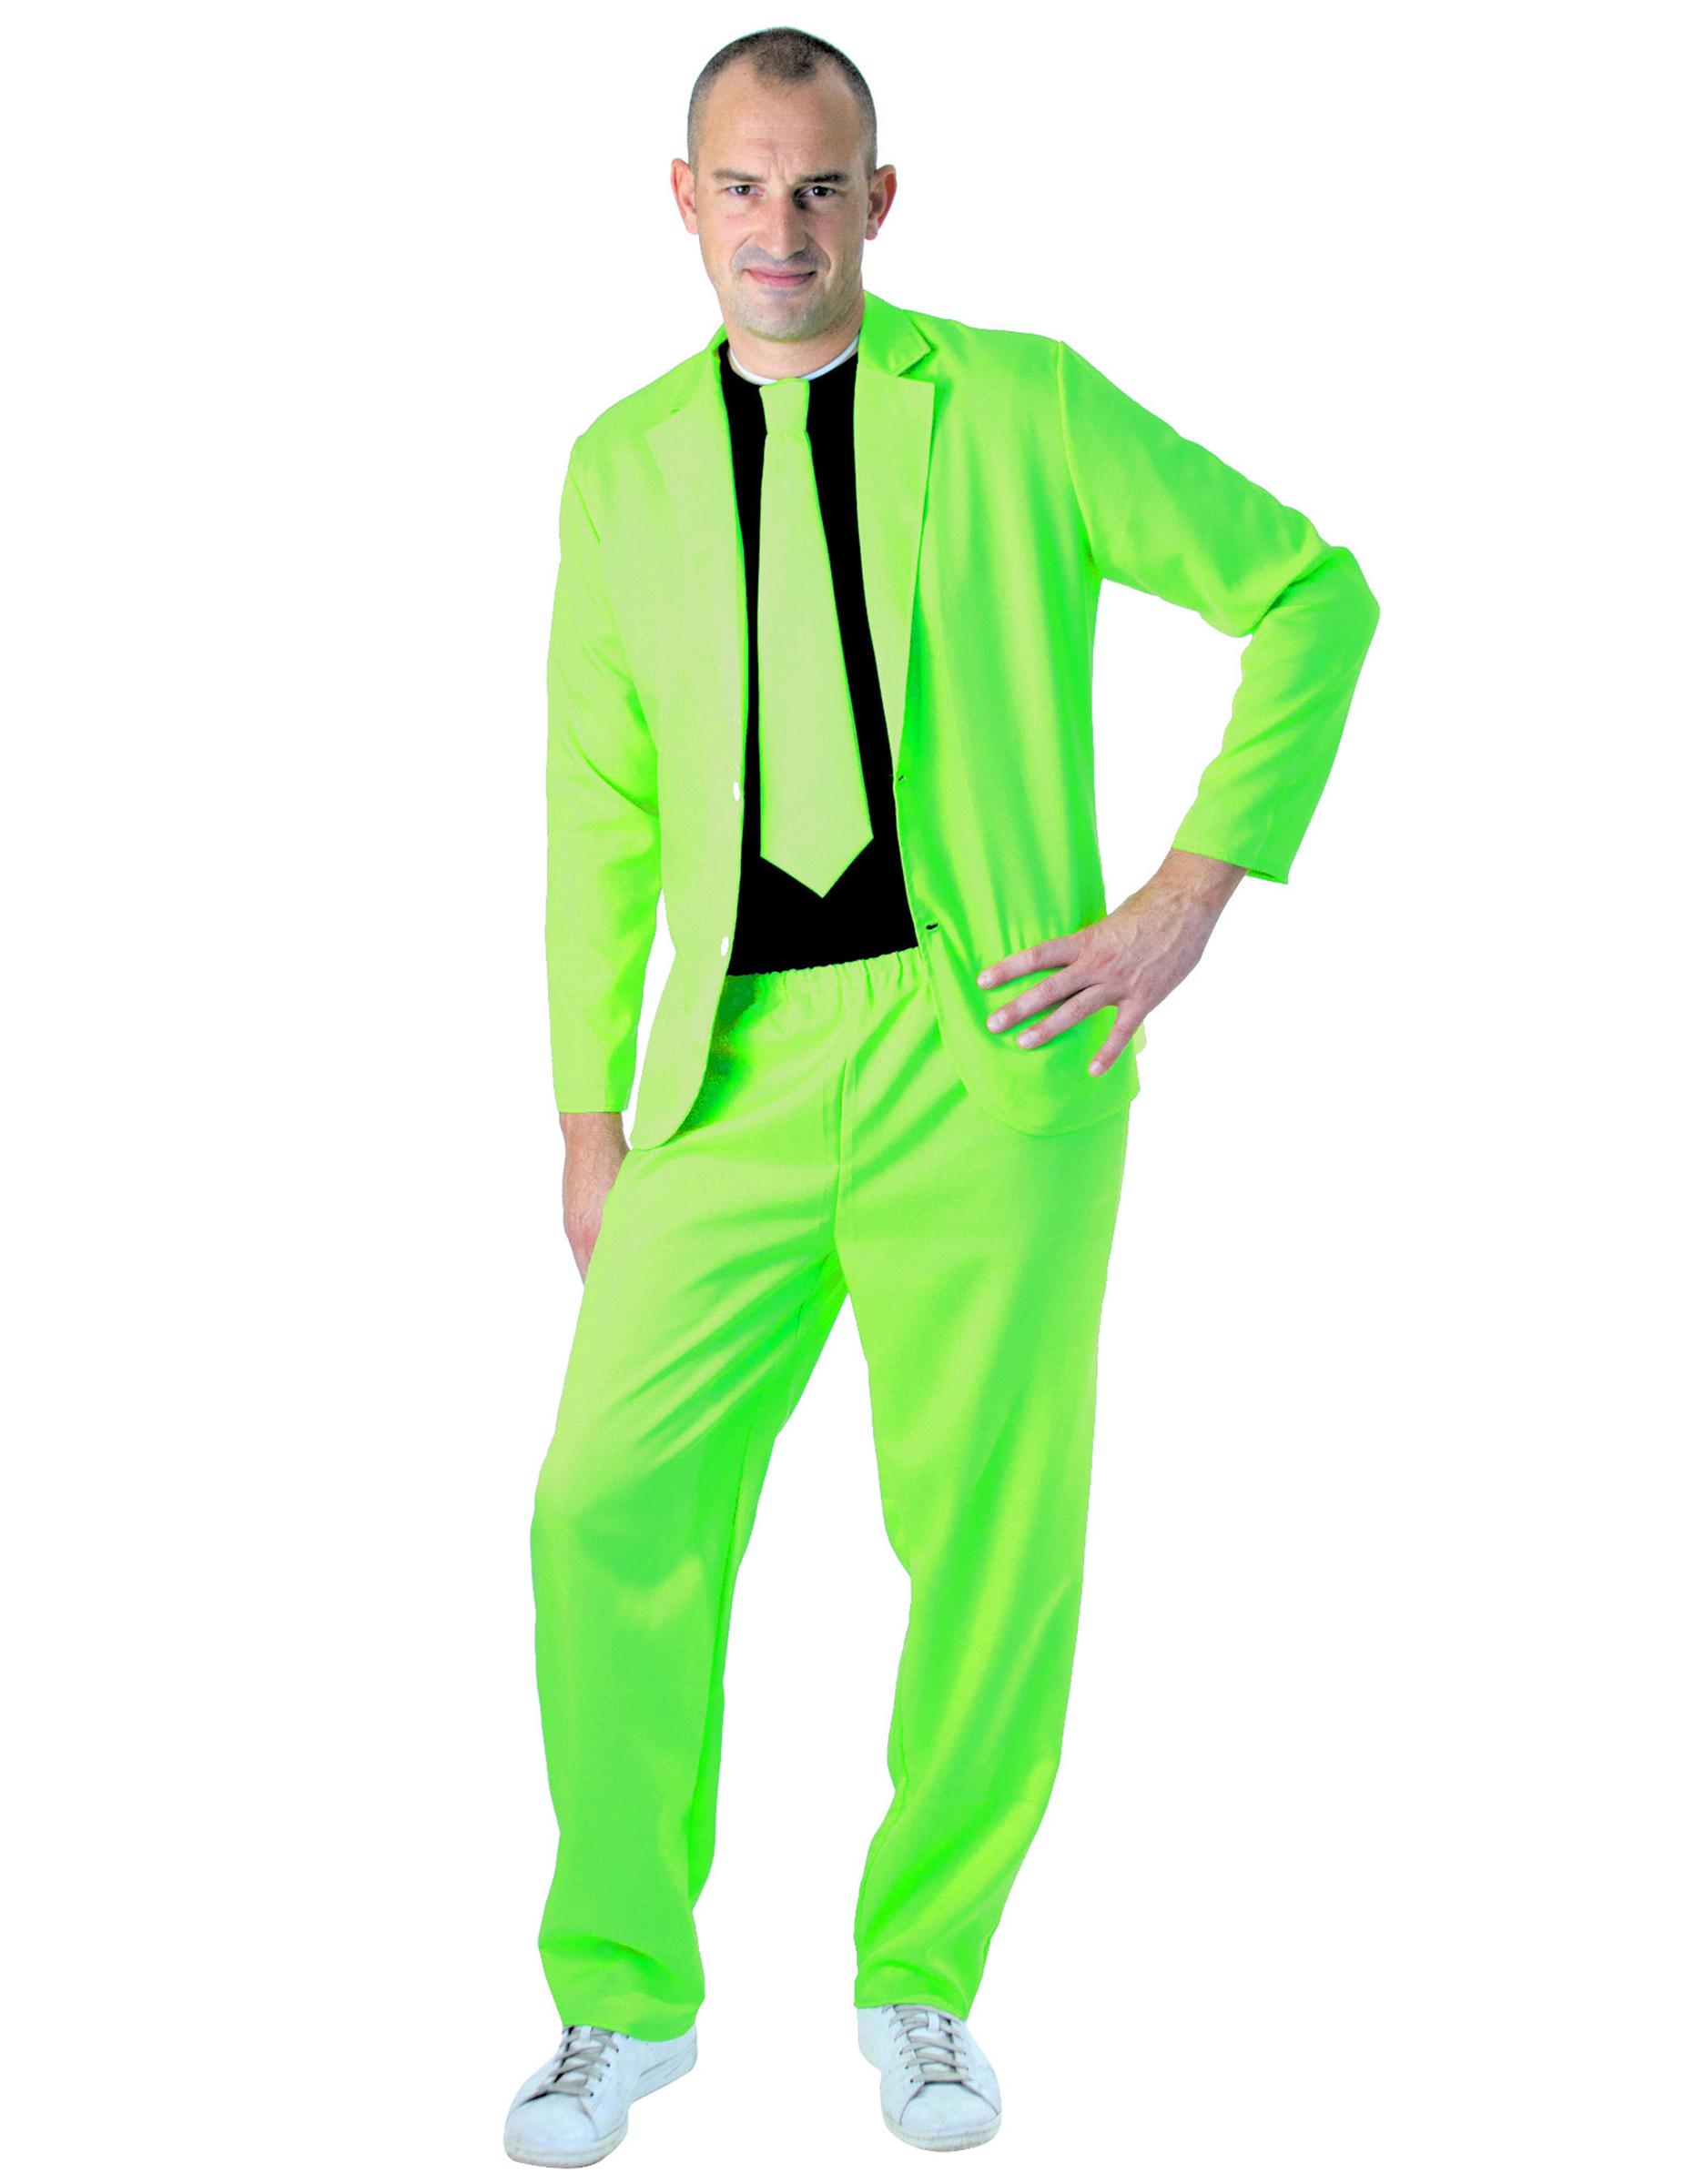 Anzug Fur Herren Neongrun Gunstige Faschings Kostume Bei Karneval